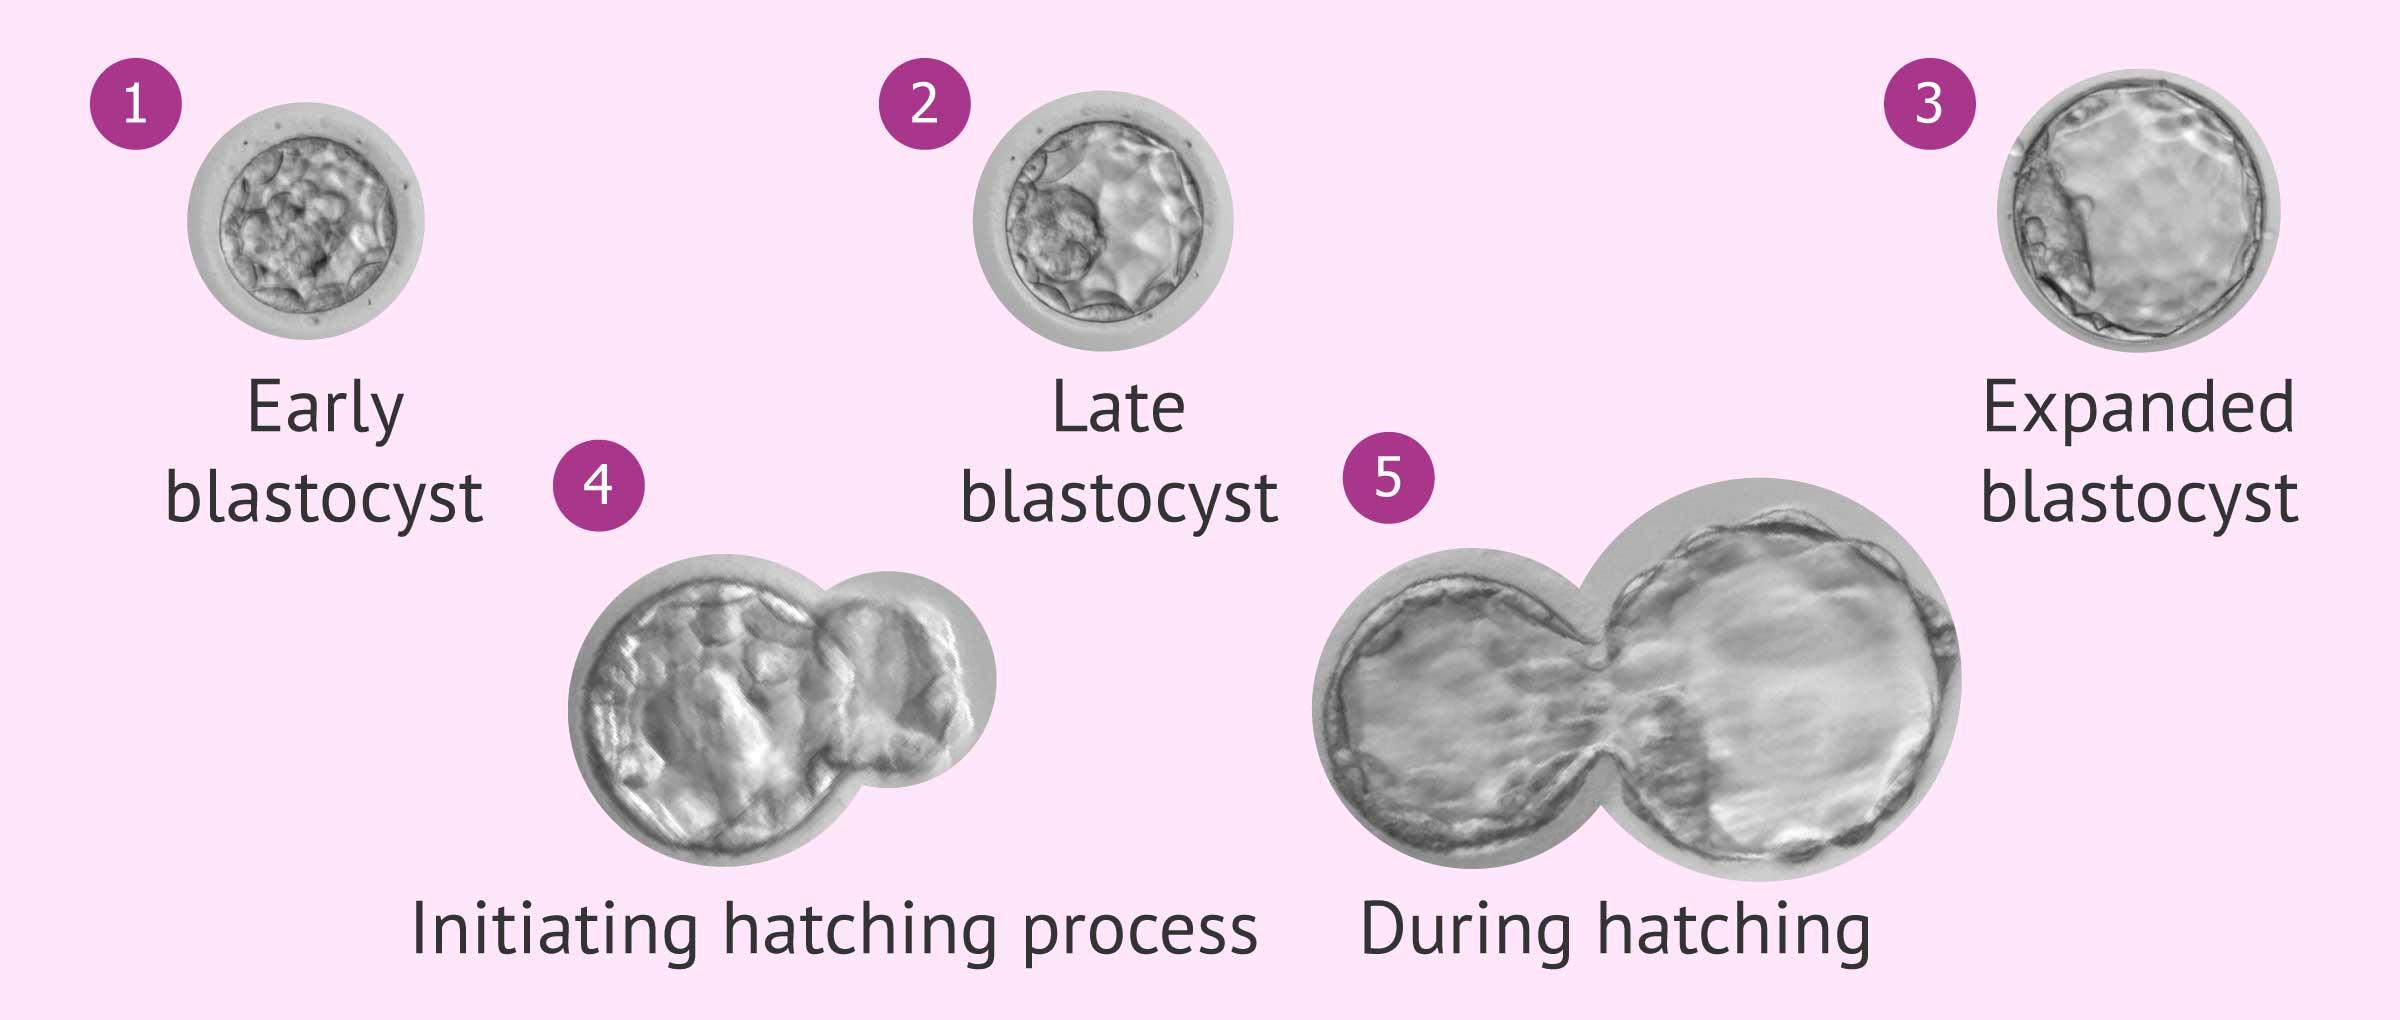 Blastocyst expansion rates